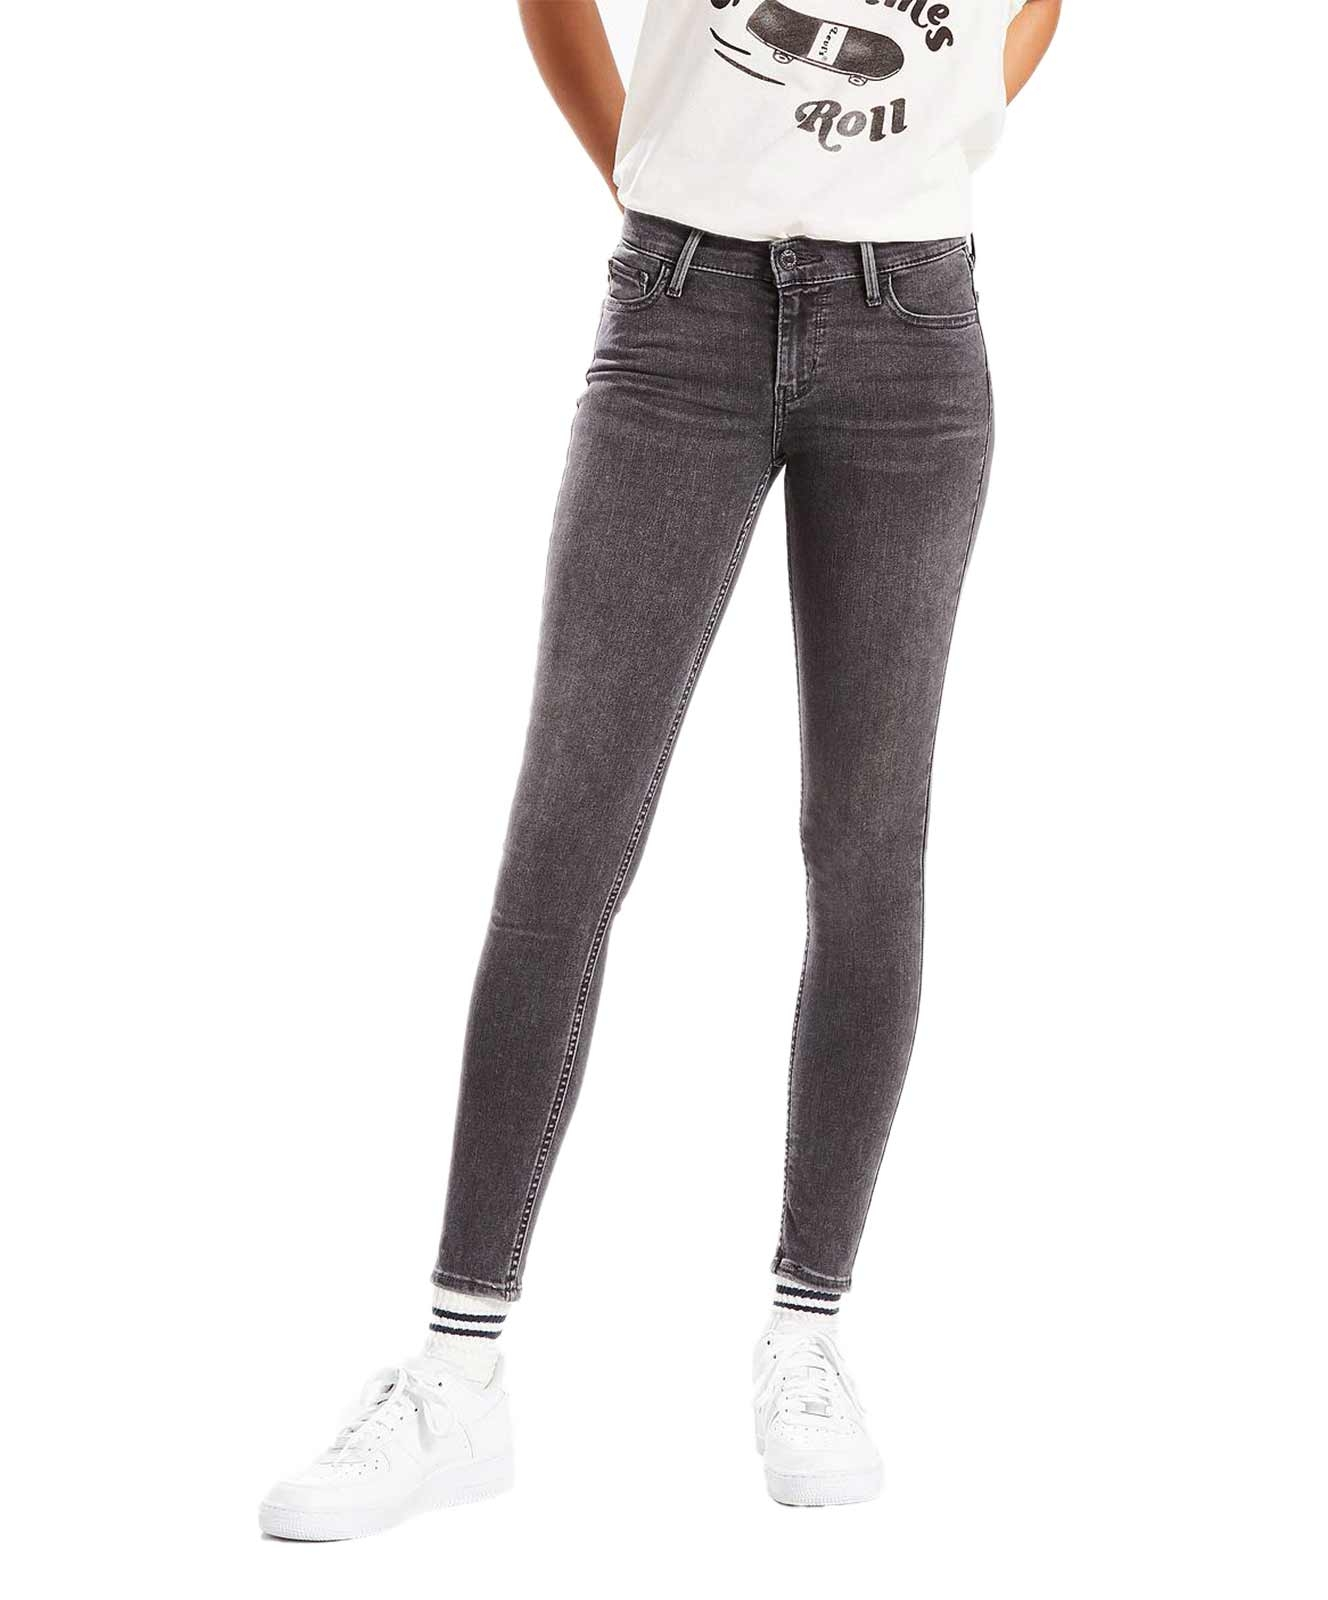 Hosen für Frauen - LEVI'S 710 Skinny Jeans Fancy That  - Onlineshop Jeans Meile